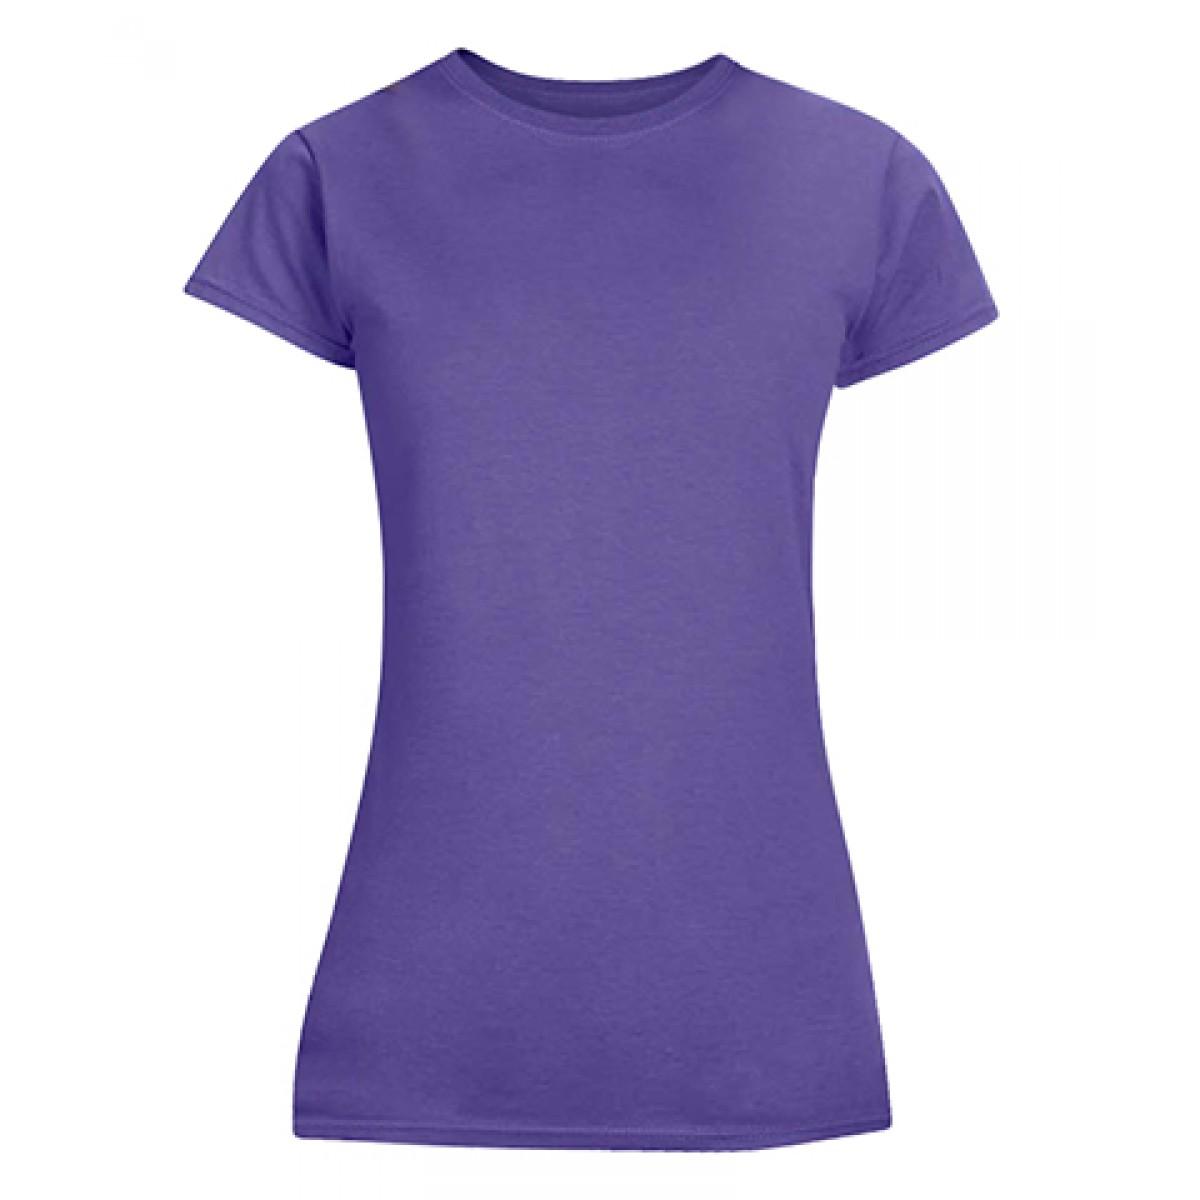 Junior Fit T-Shirt